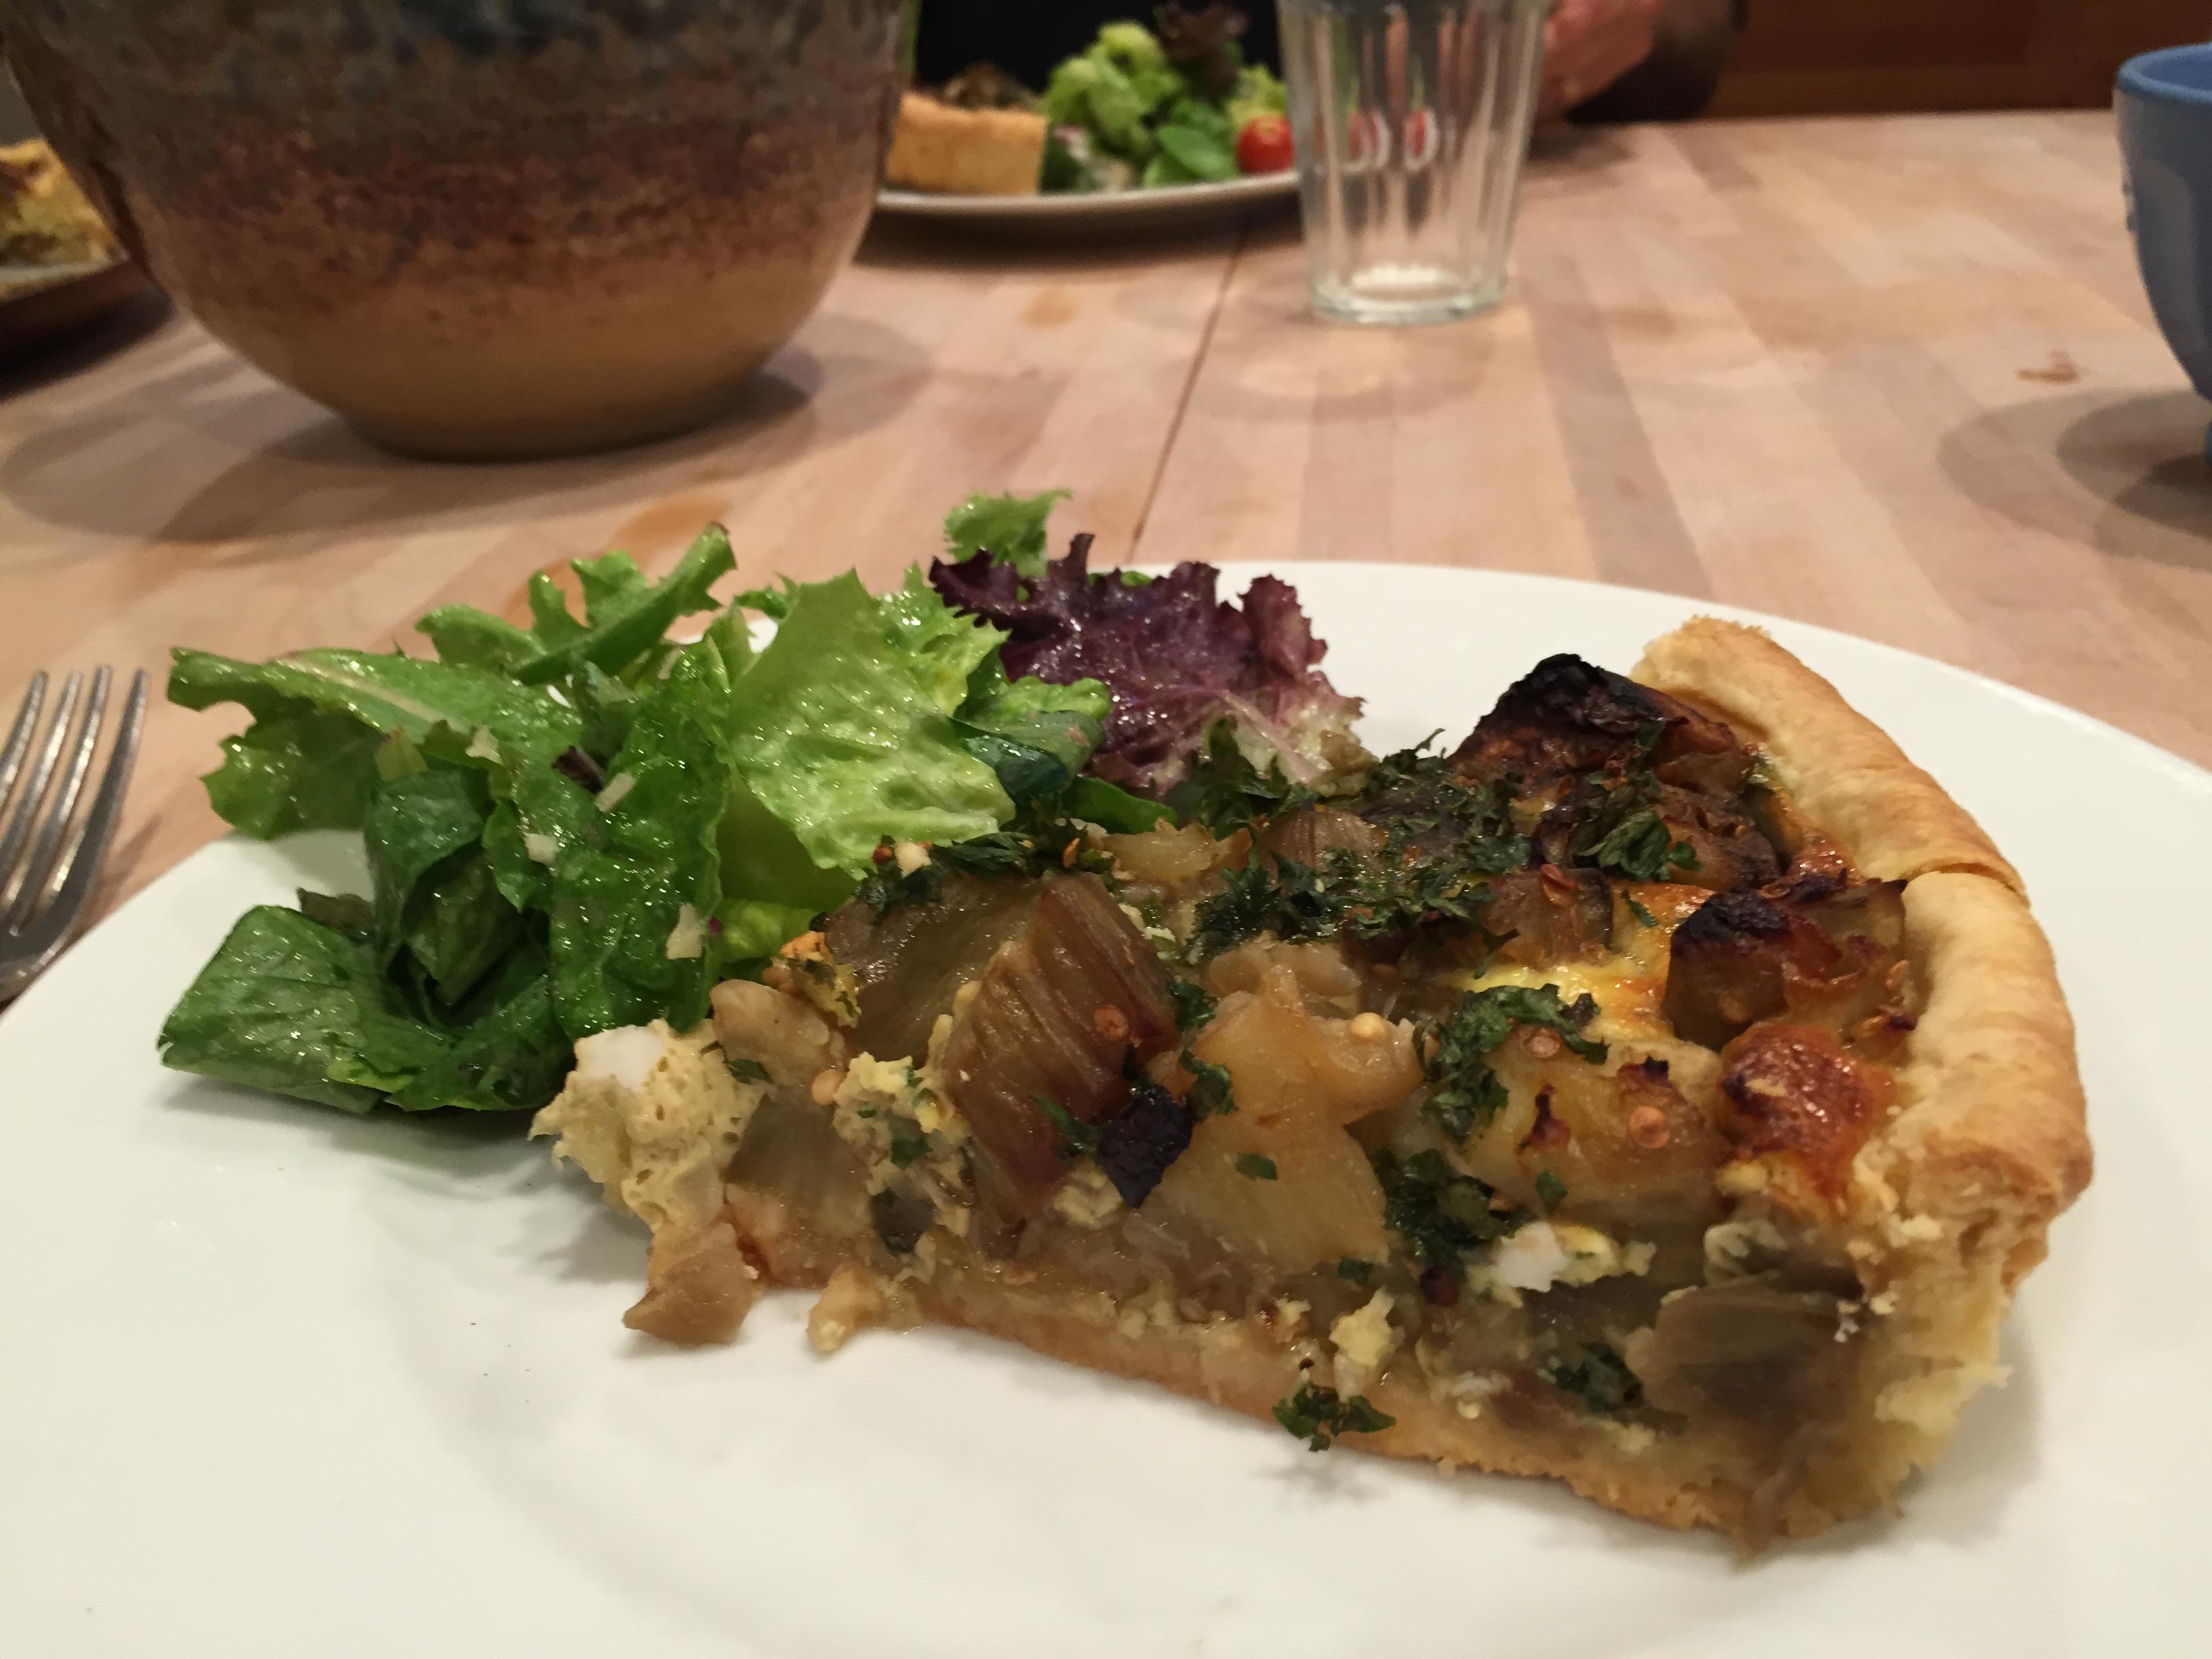 Eggplant Savory Tart